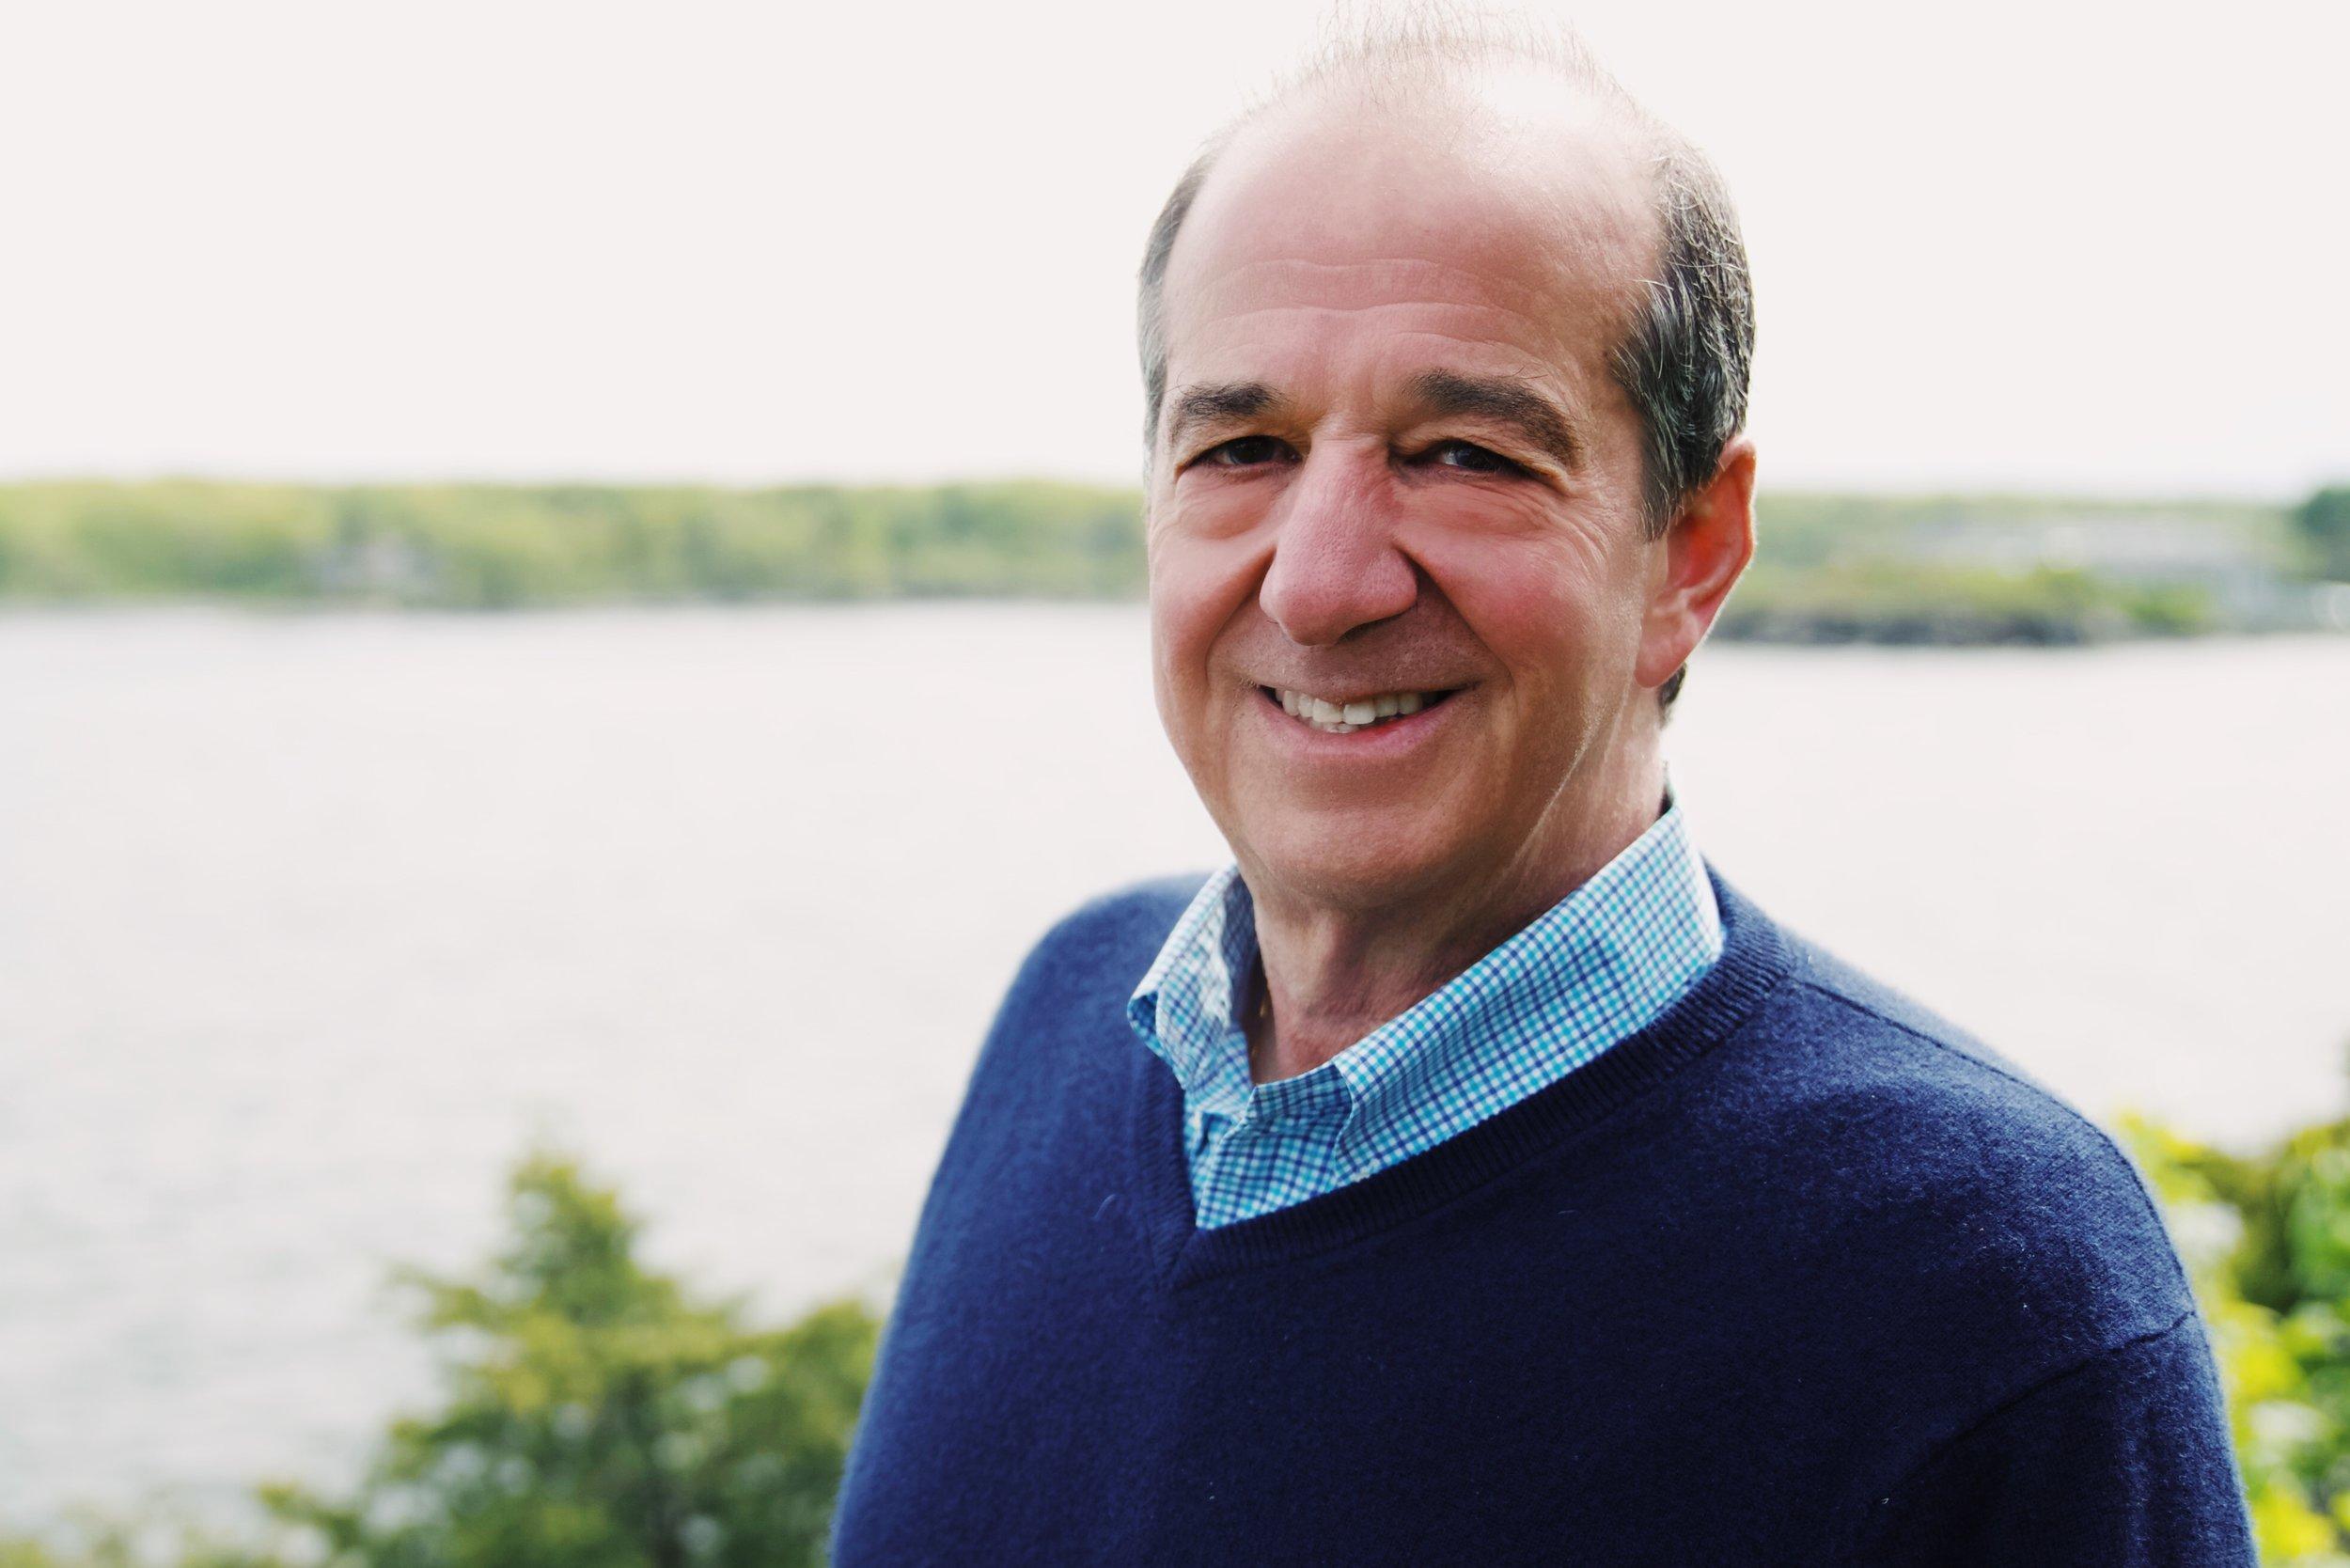 David Azarian, Esq. - 30 Years Experience